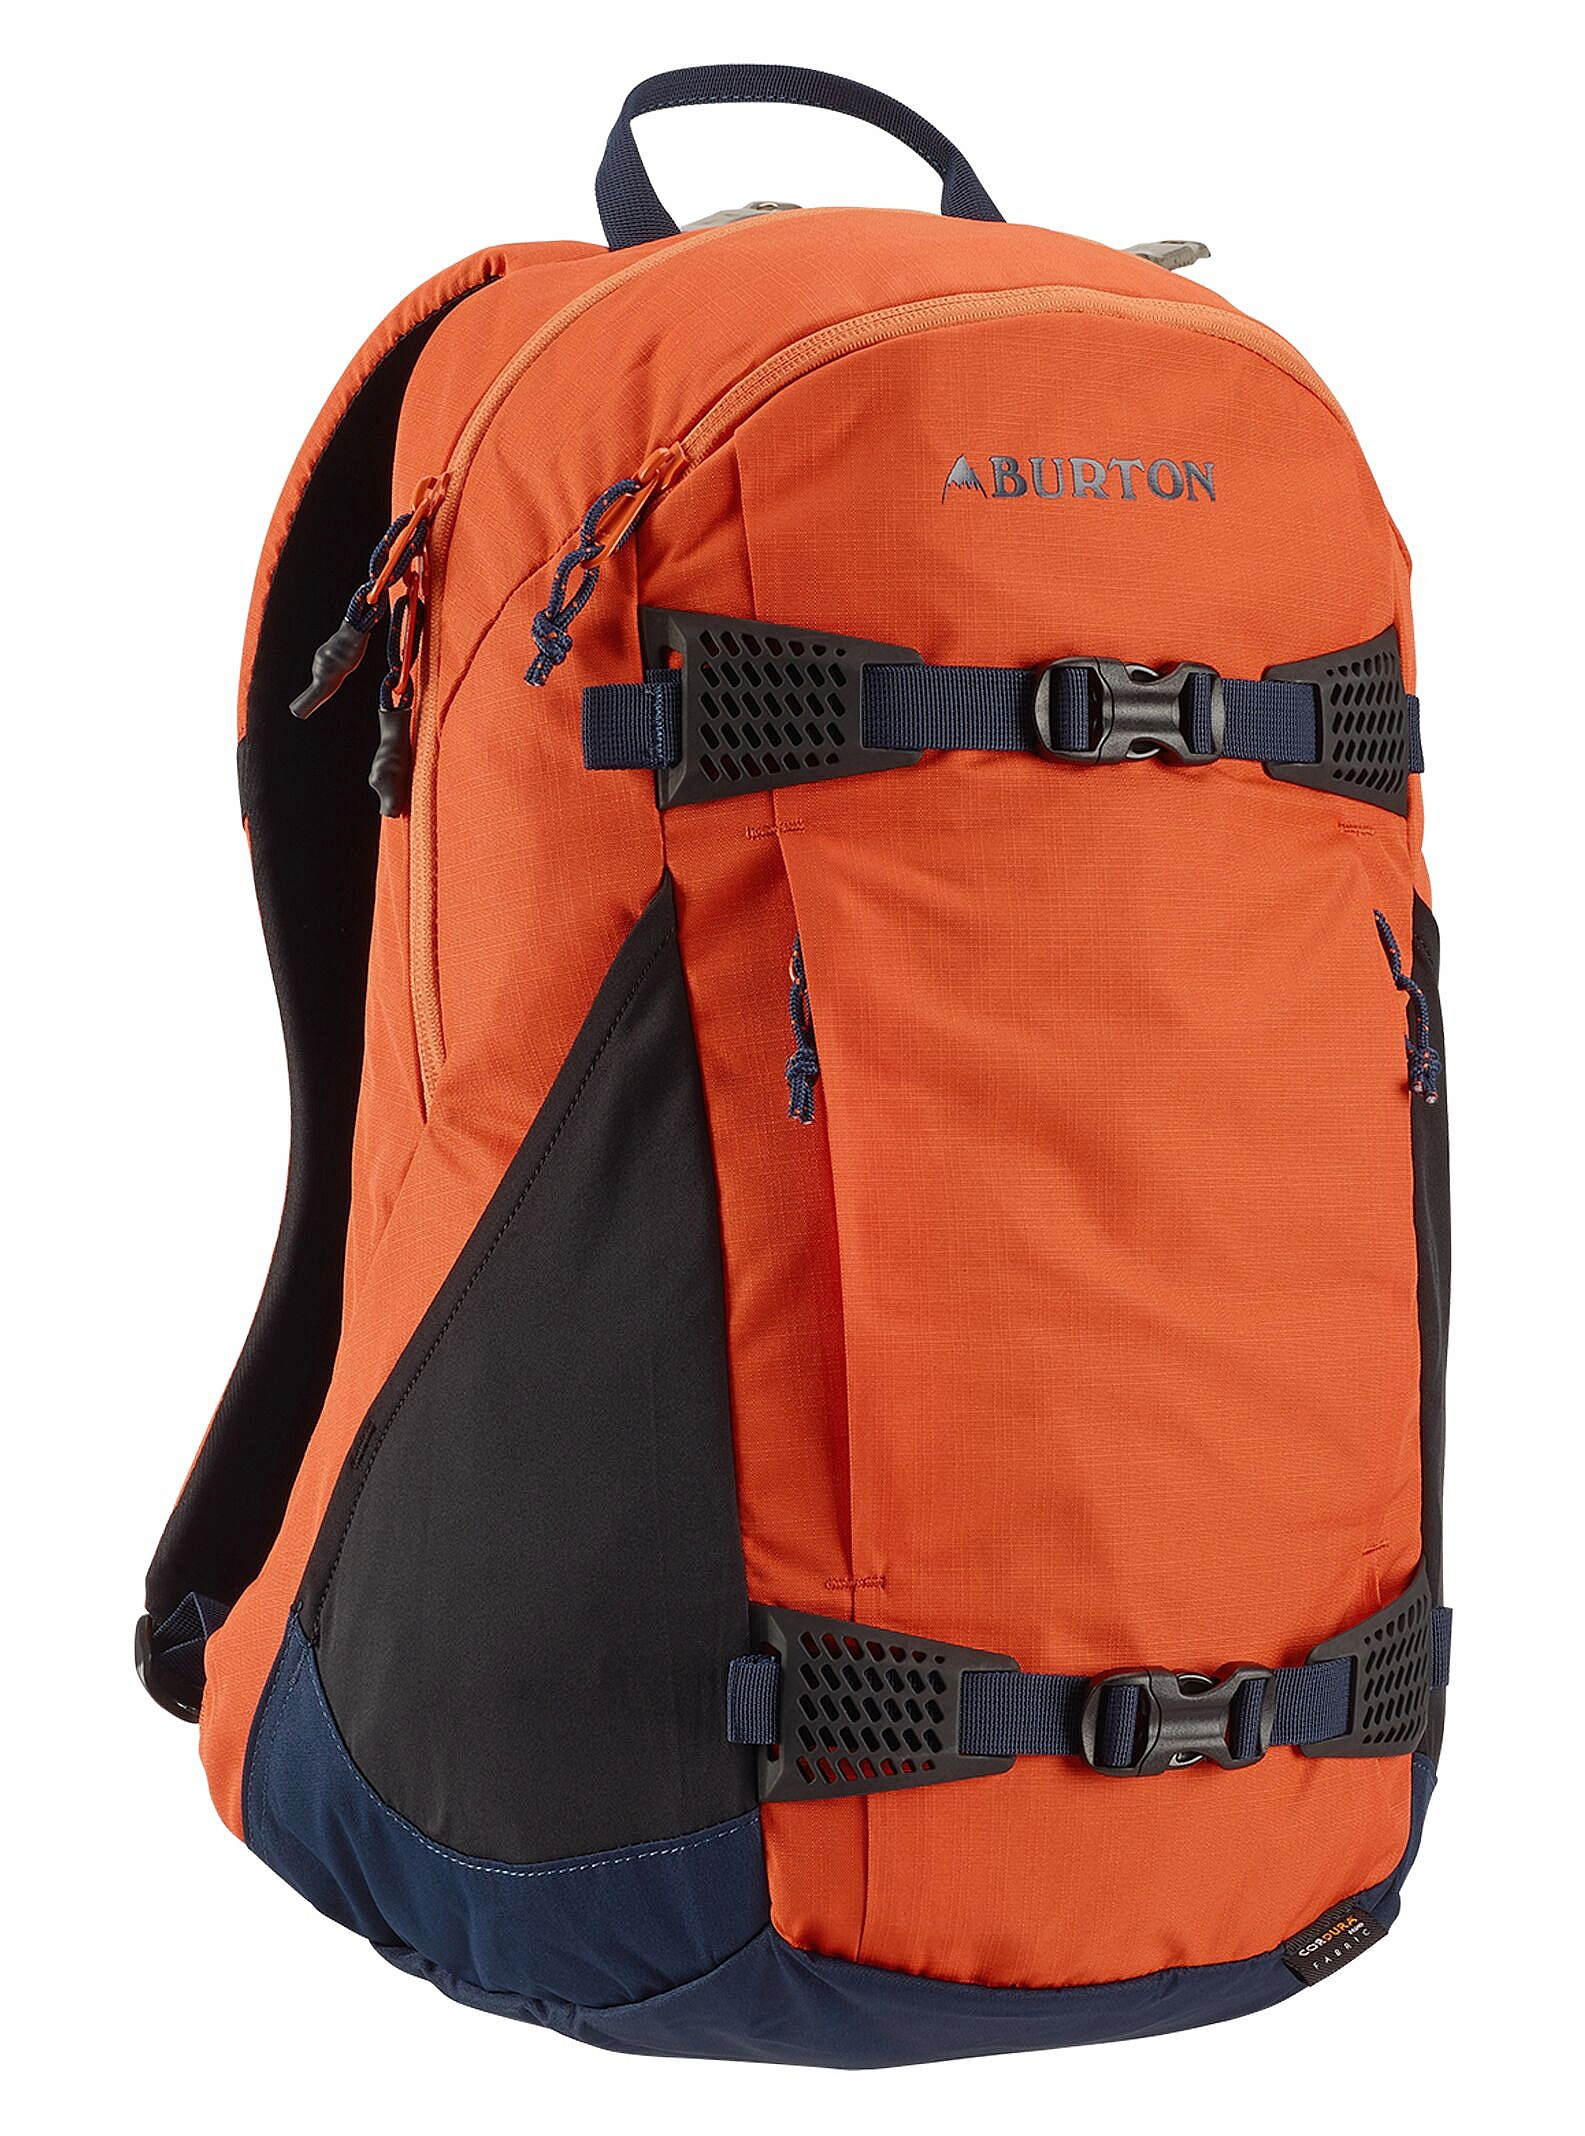 batoh Burton Day Hiker 25 - Orangeade Triple Ripstop Cordura 25 L